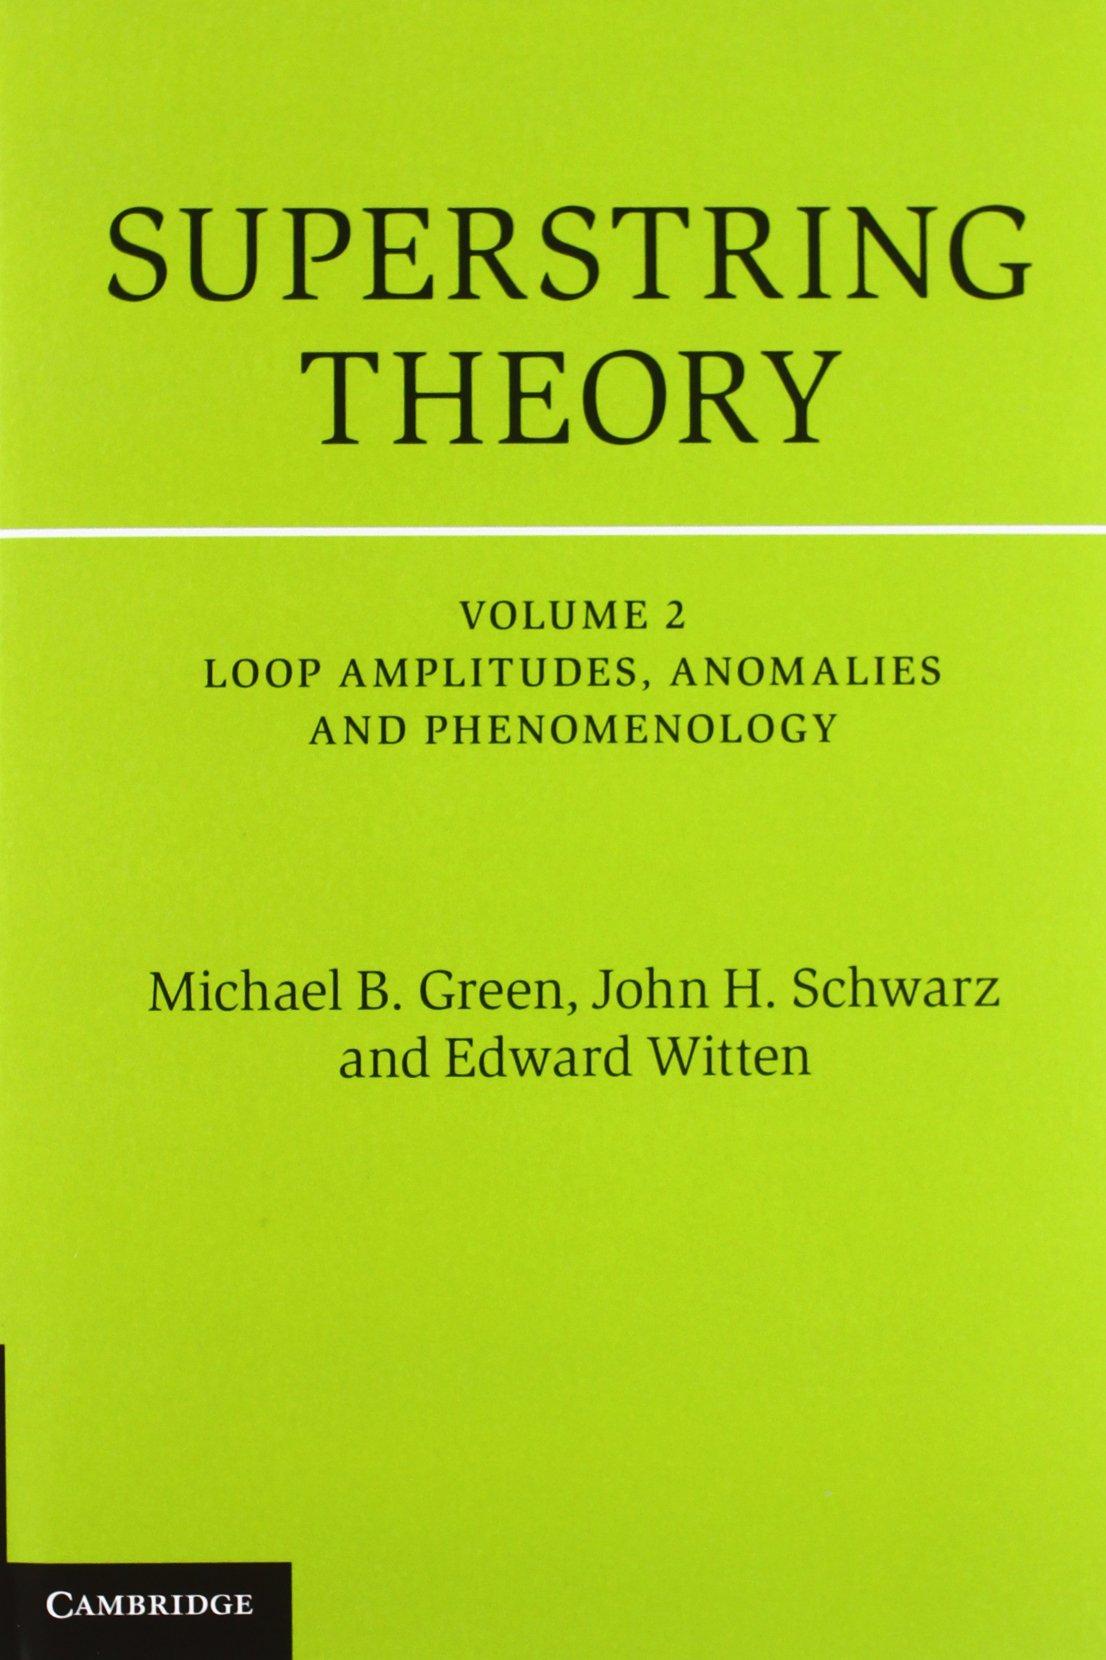 Superstring Theory 2 Volume Hardback Set: 25th Anniversary Edition (Cambridge  Monographs on Mathematical Physics): Amazon.co.uk: Michael B. Green, ...